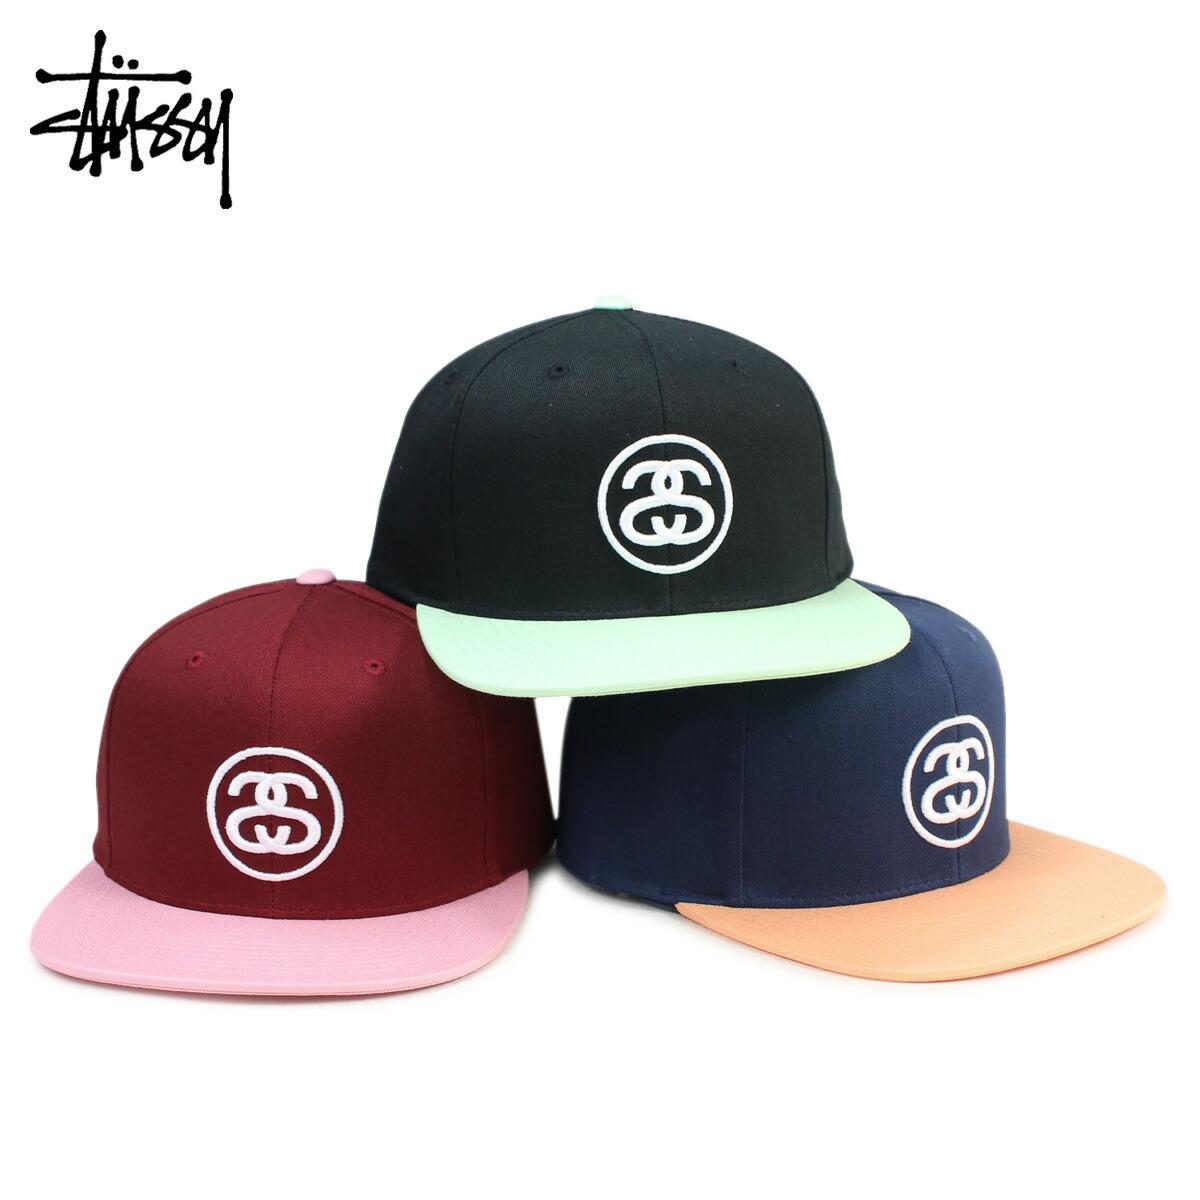 feab7ef31e2 Sugar Online Shop  ステューシー STUSSY cap hat men gap Dis snapback ...